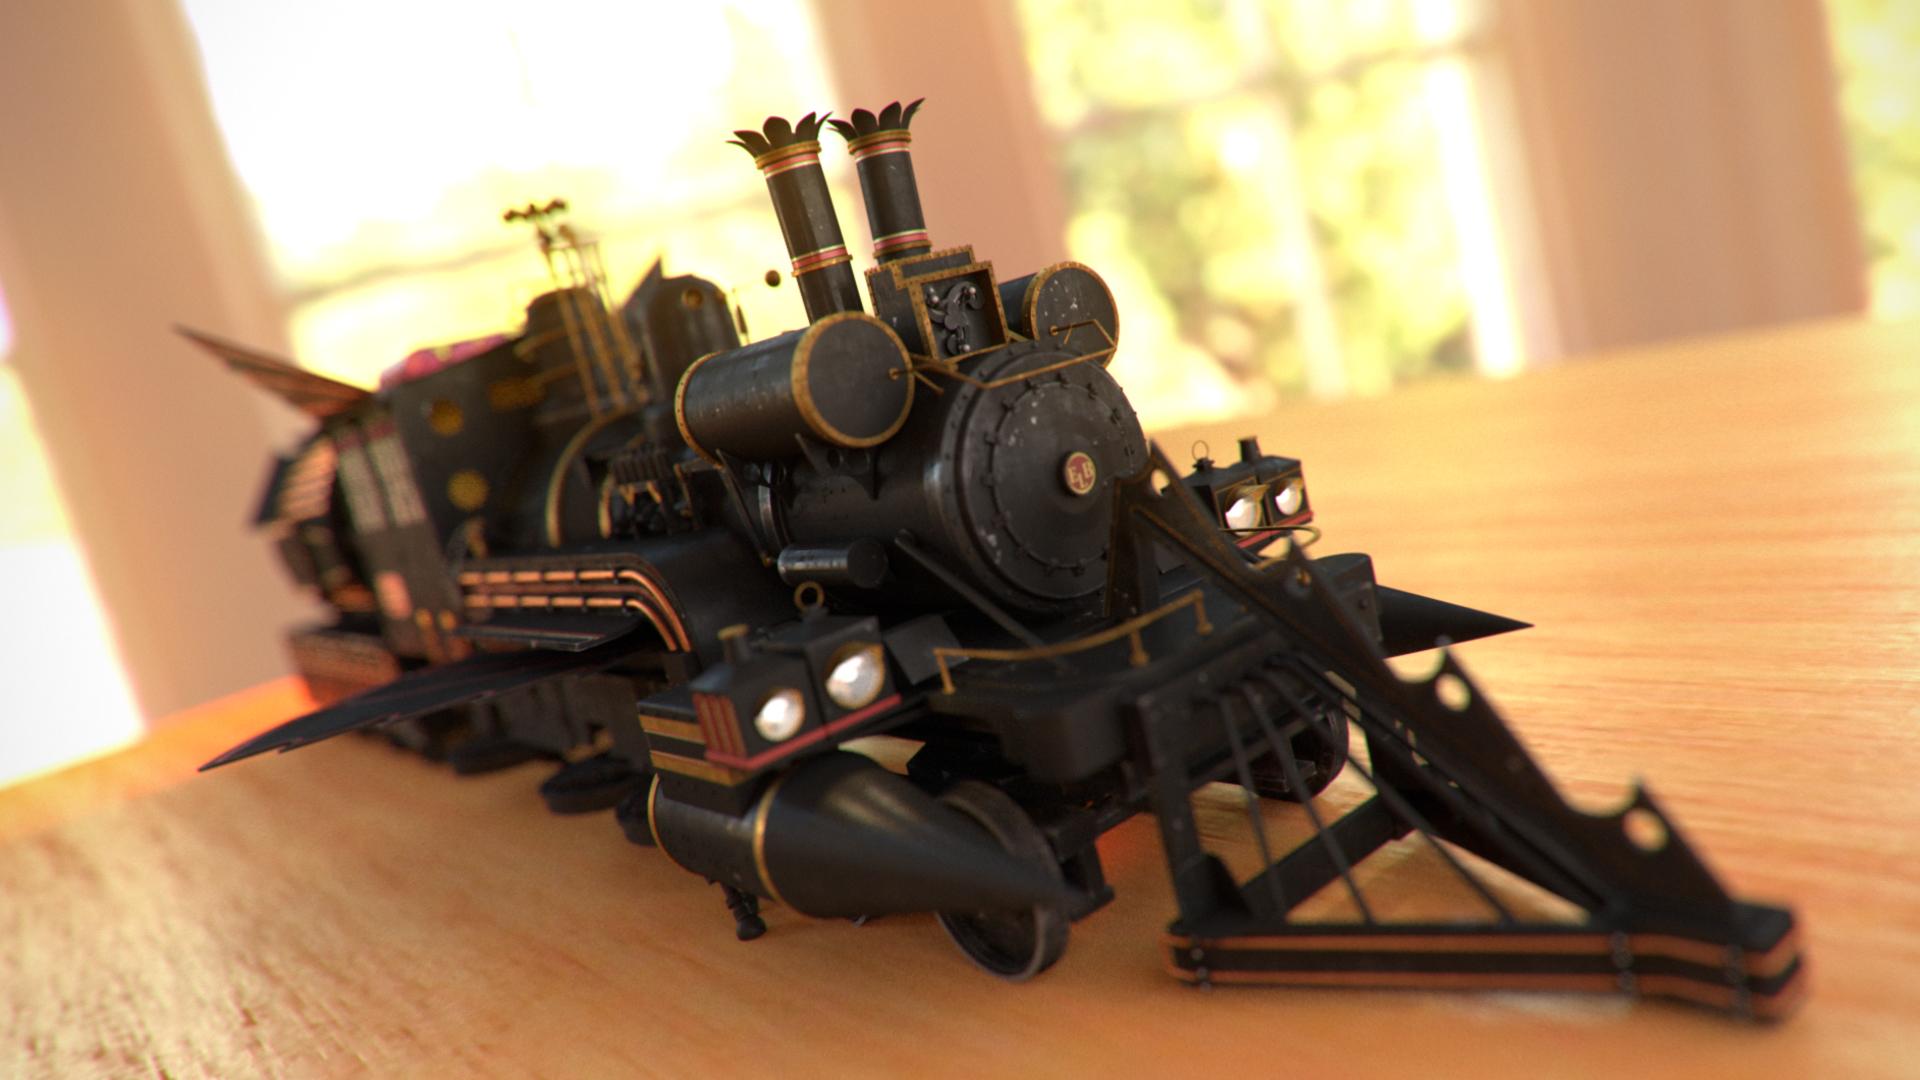 Train Jules Vernes render toy by Zlydoc